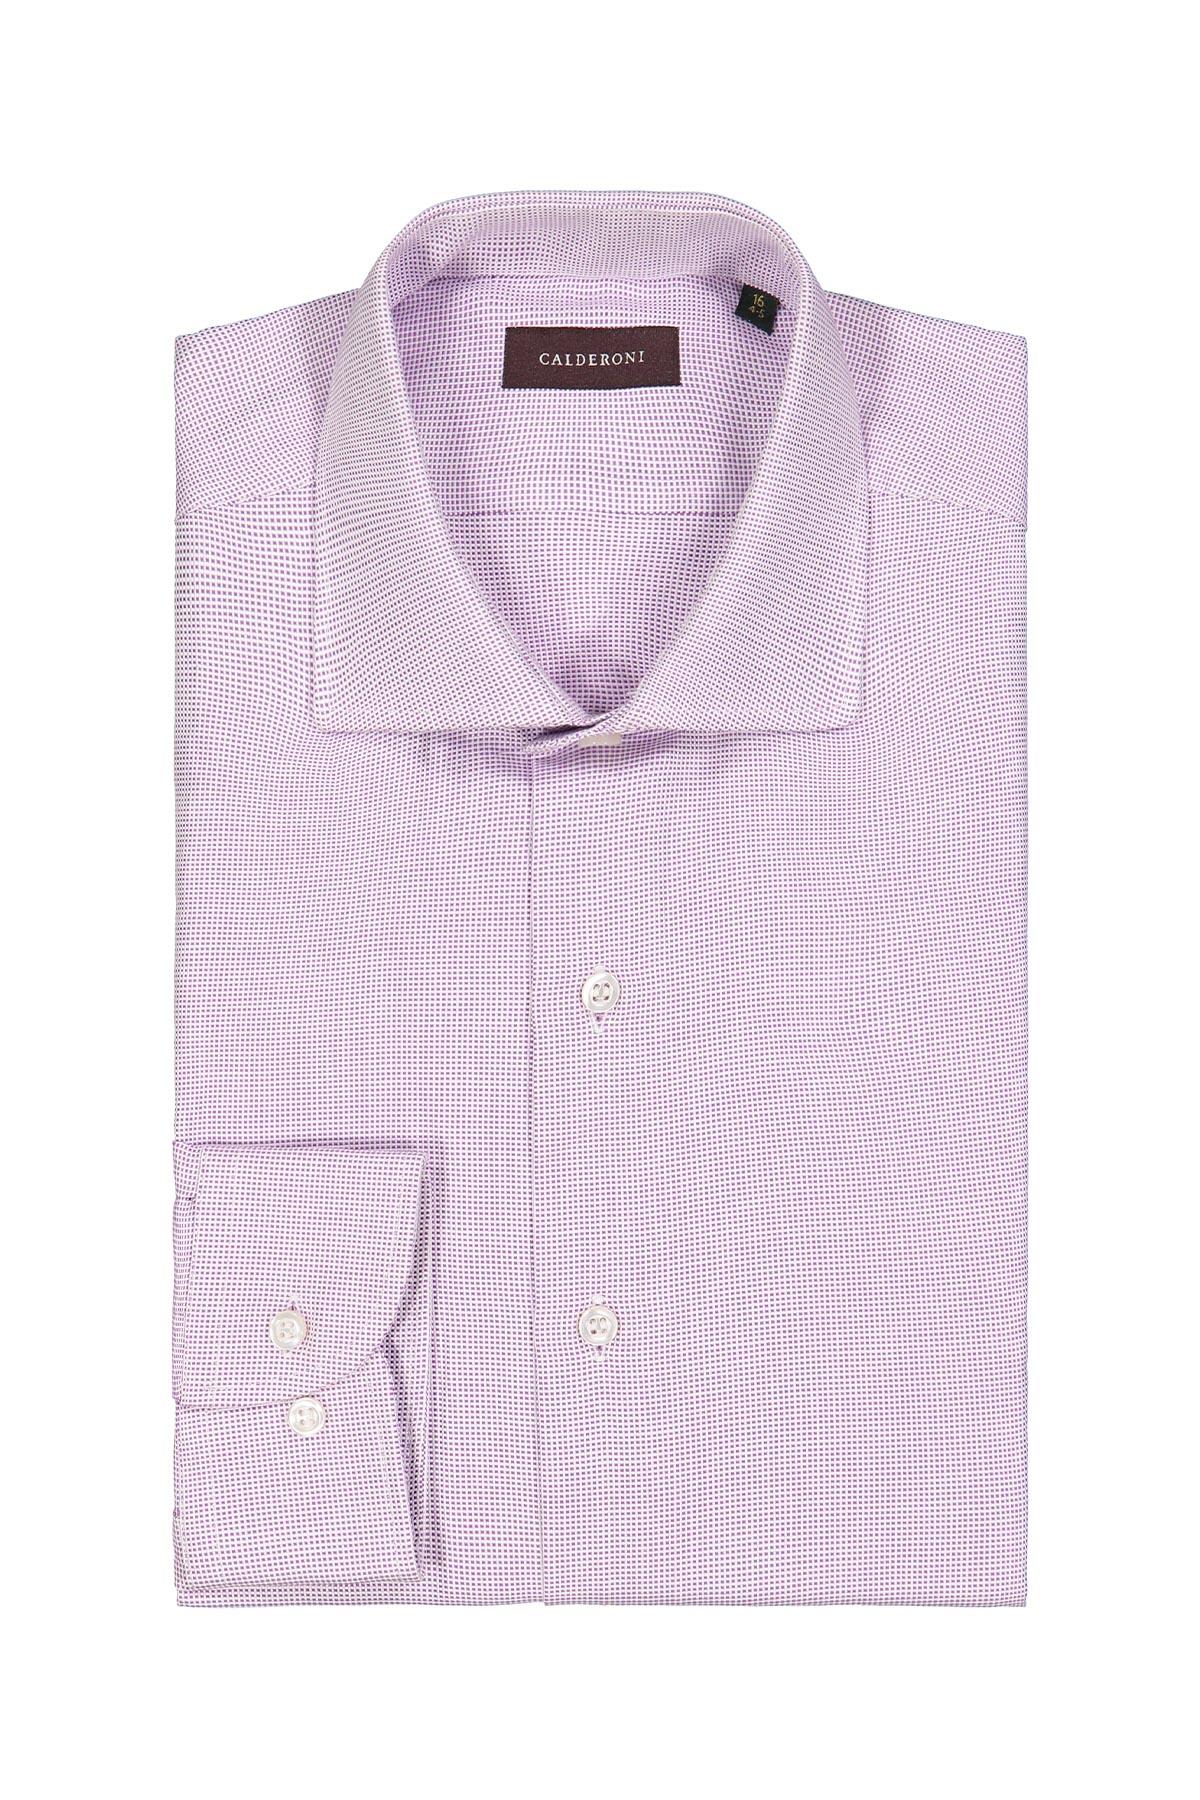 Camisa Calderoni, 100% algodón, microdiseño lila, cuello italiano.